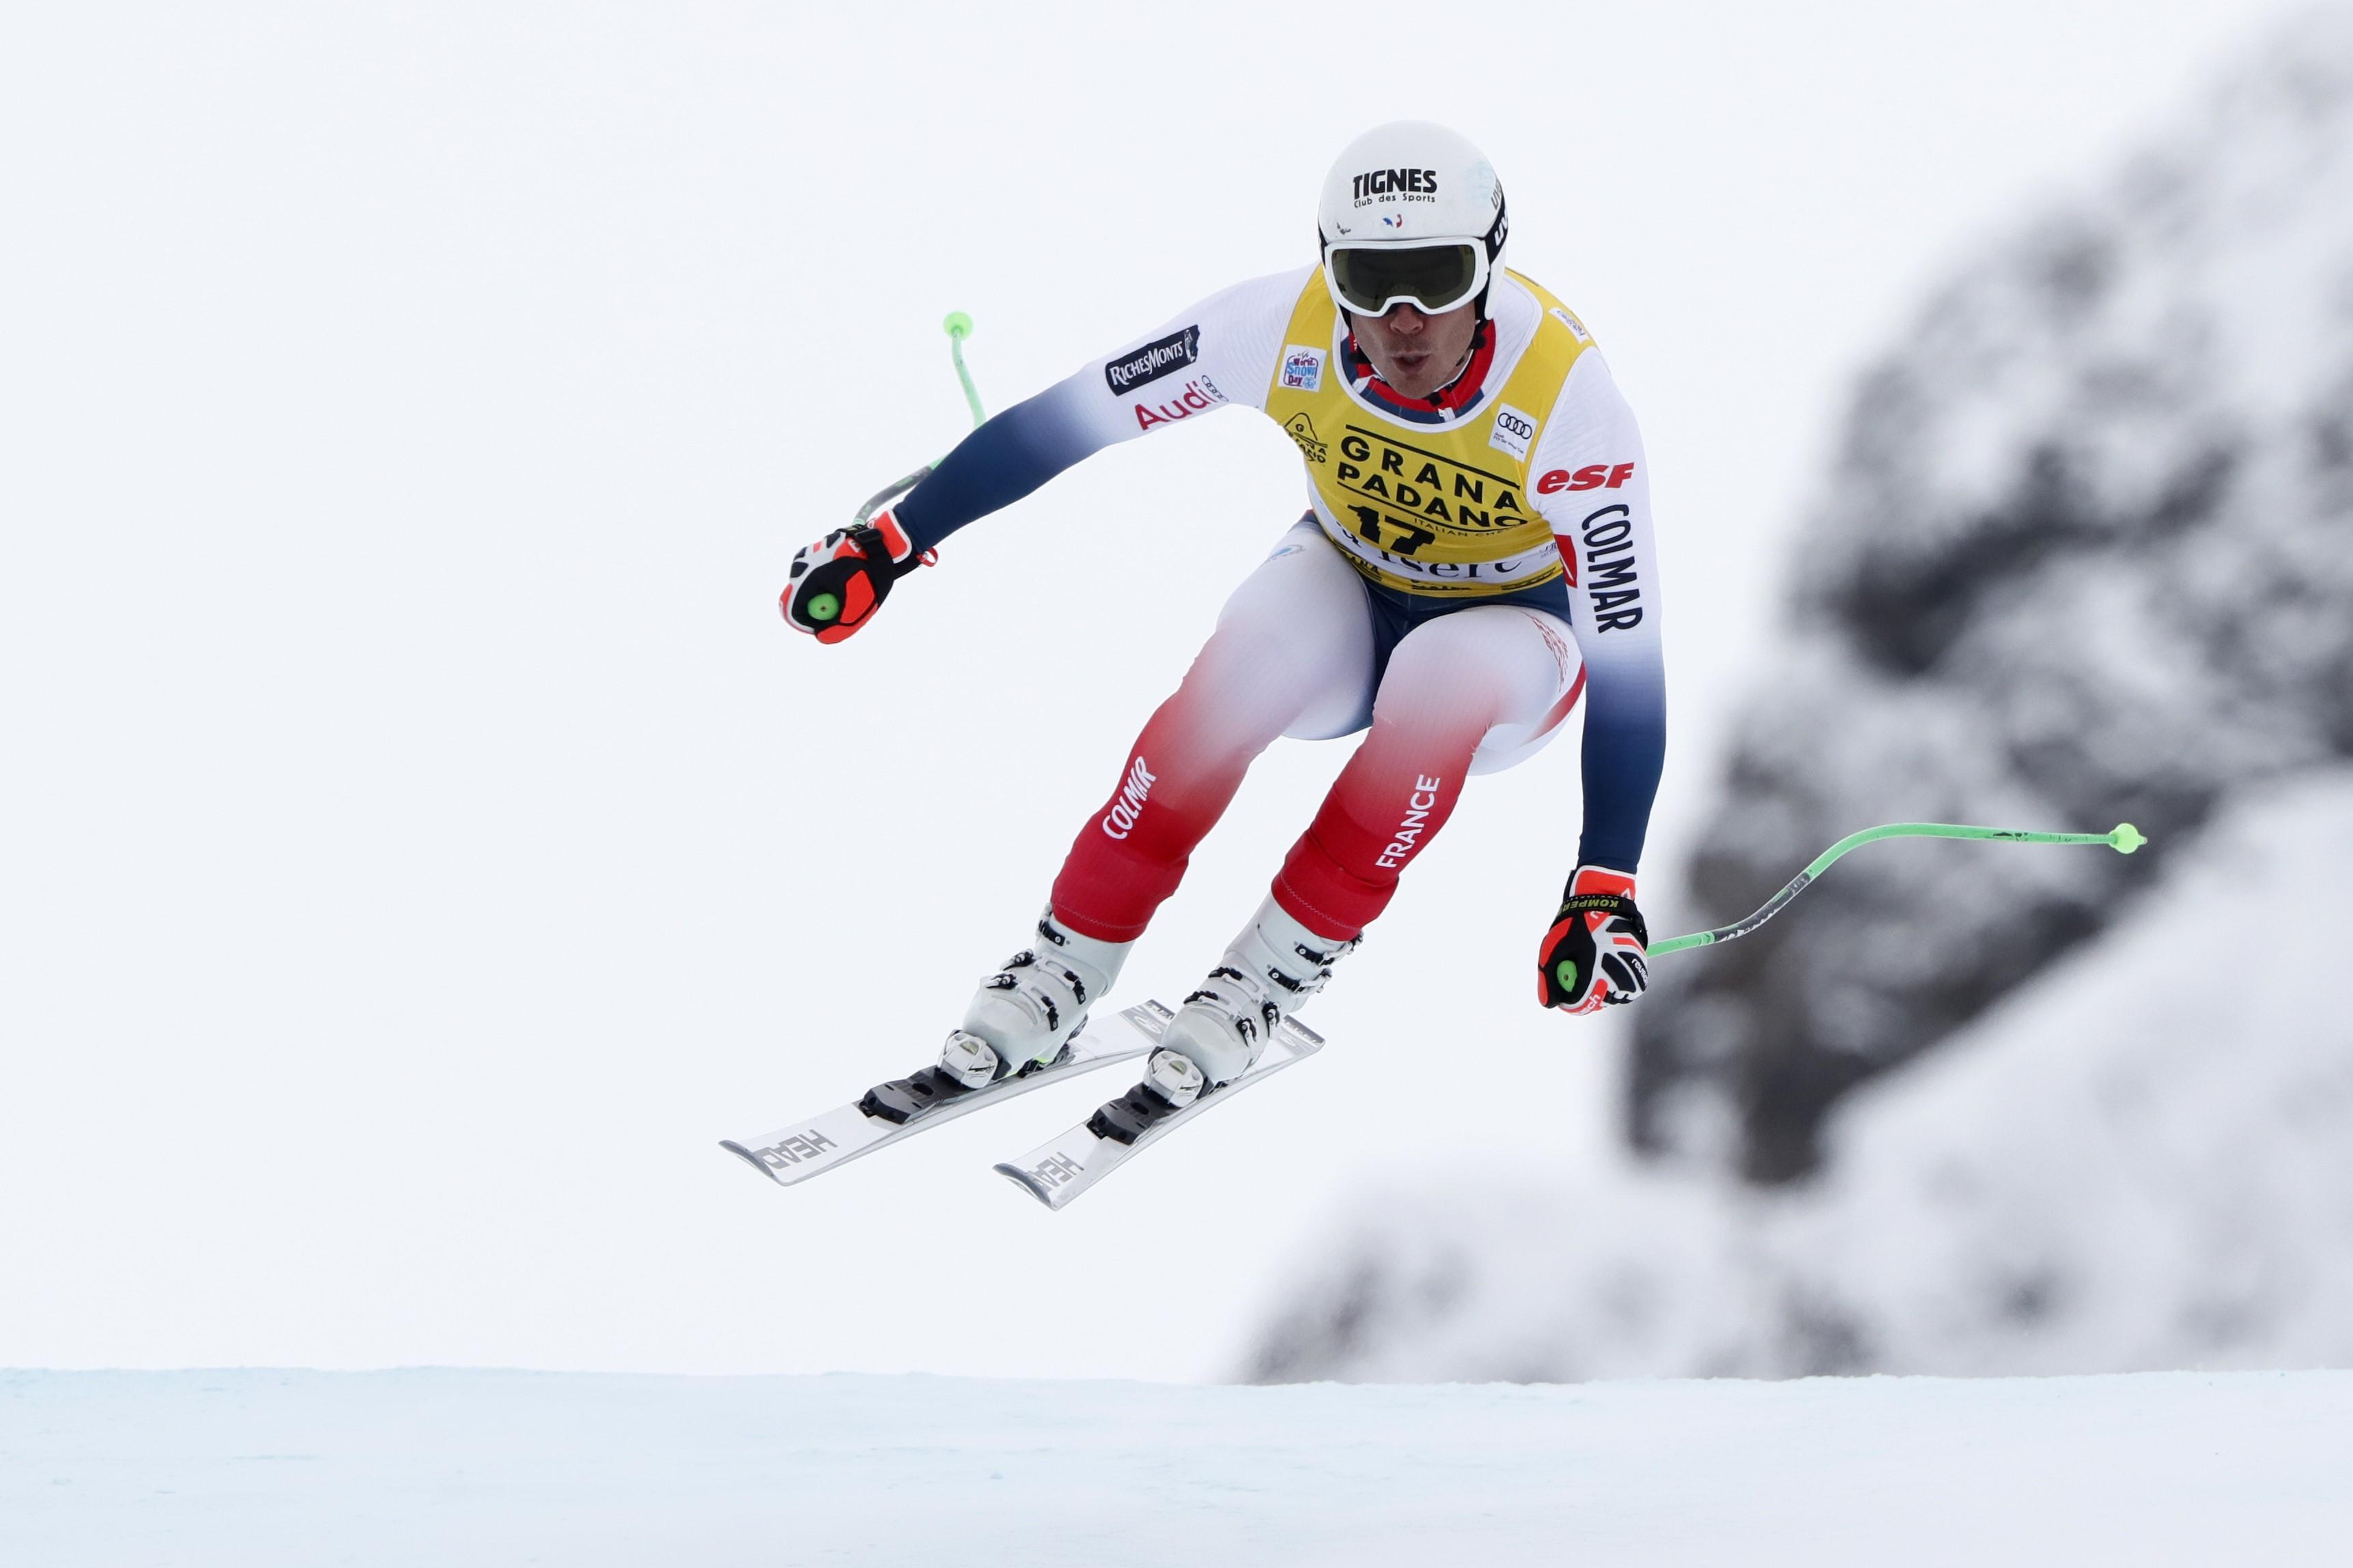 https://i.eurosport.com/2020/12/12/2954126.jpg